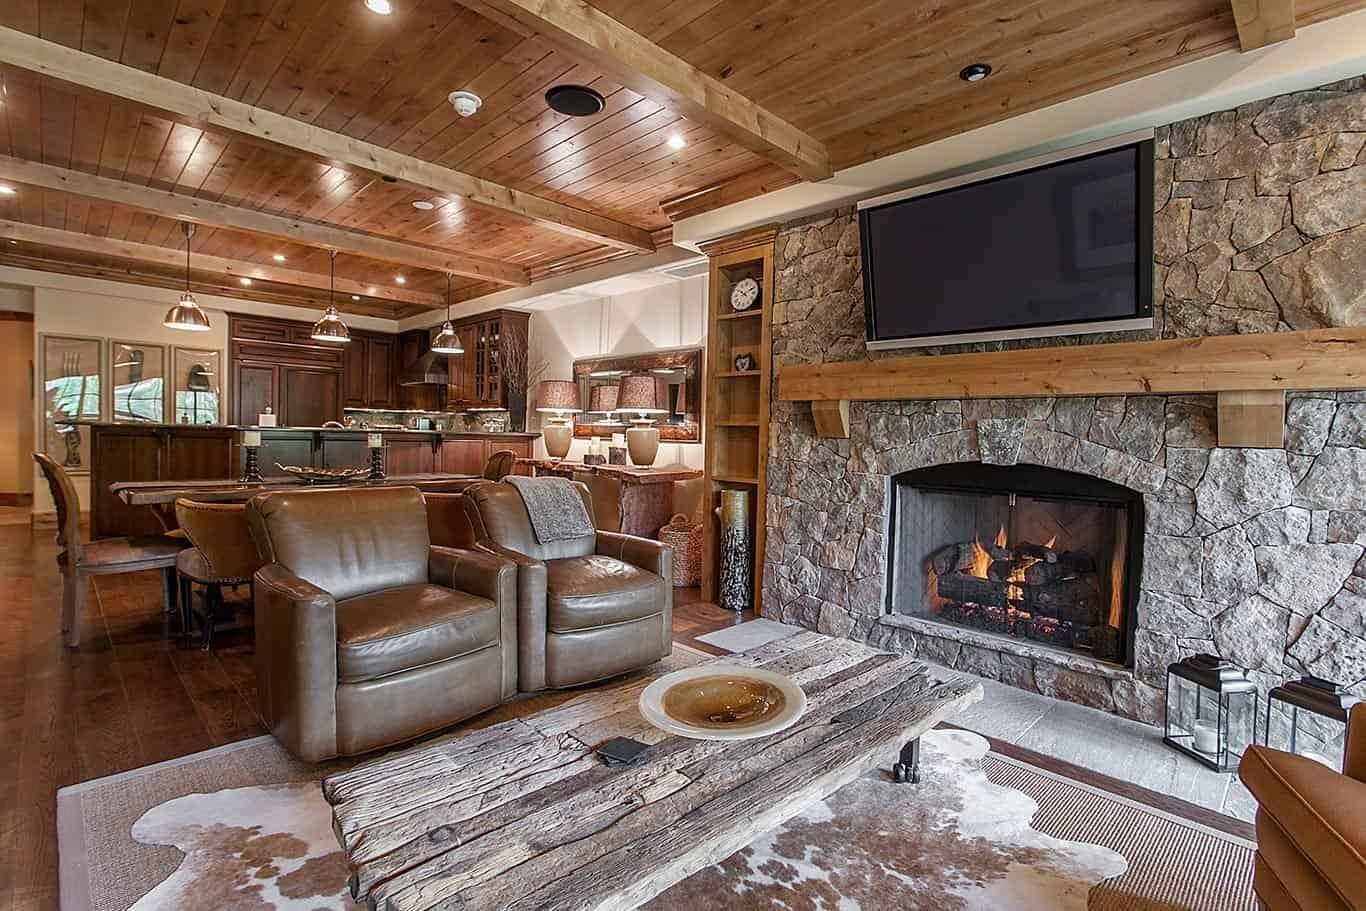 Luxury vacation rentals usa - Colorado - Vail - Mountain View Residence #205 - Image 1/25